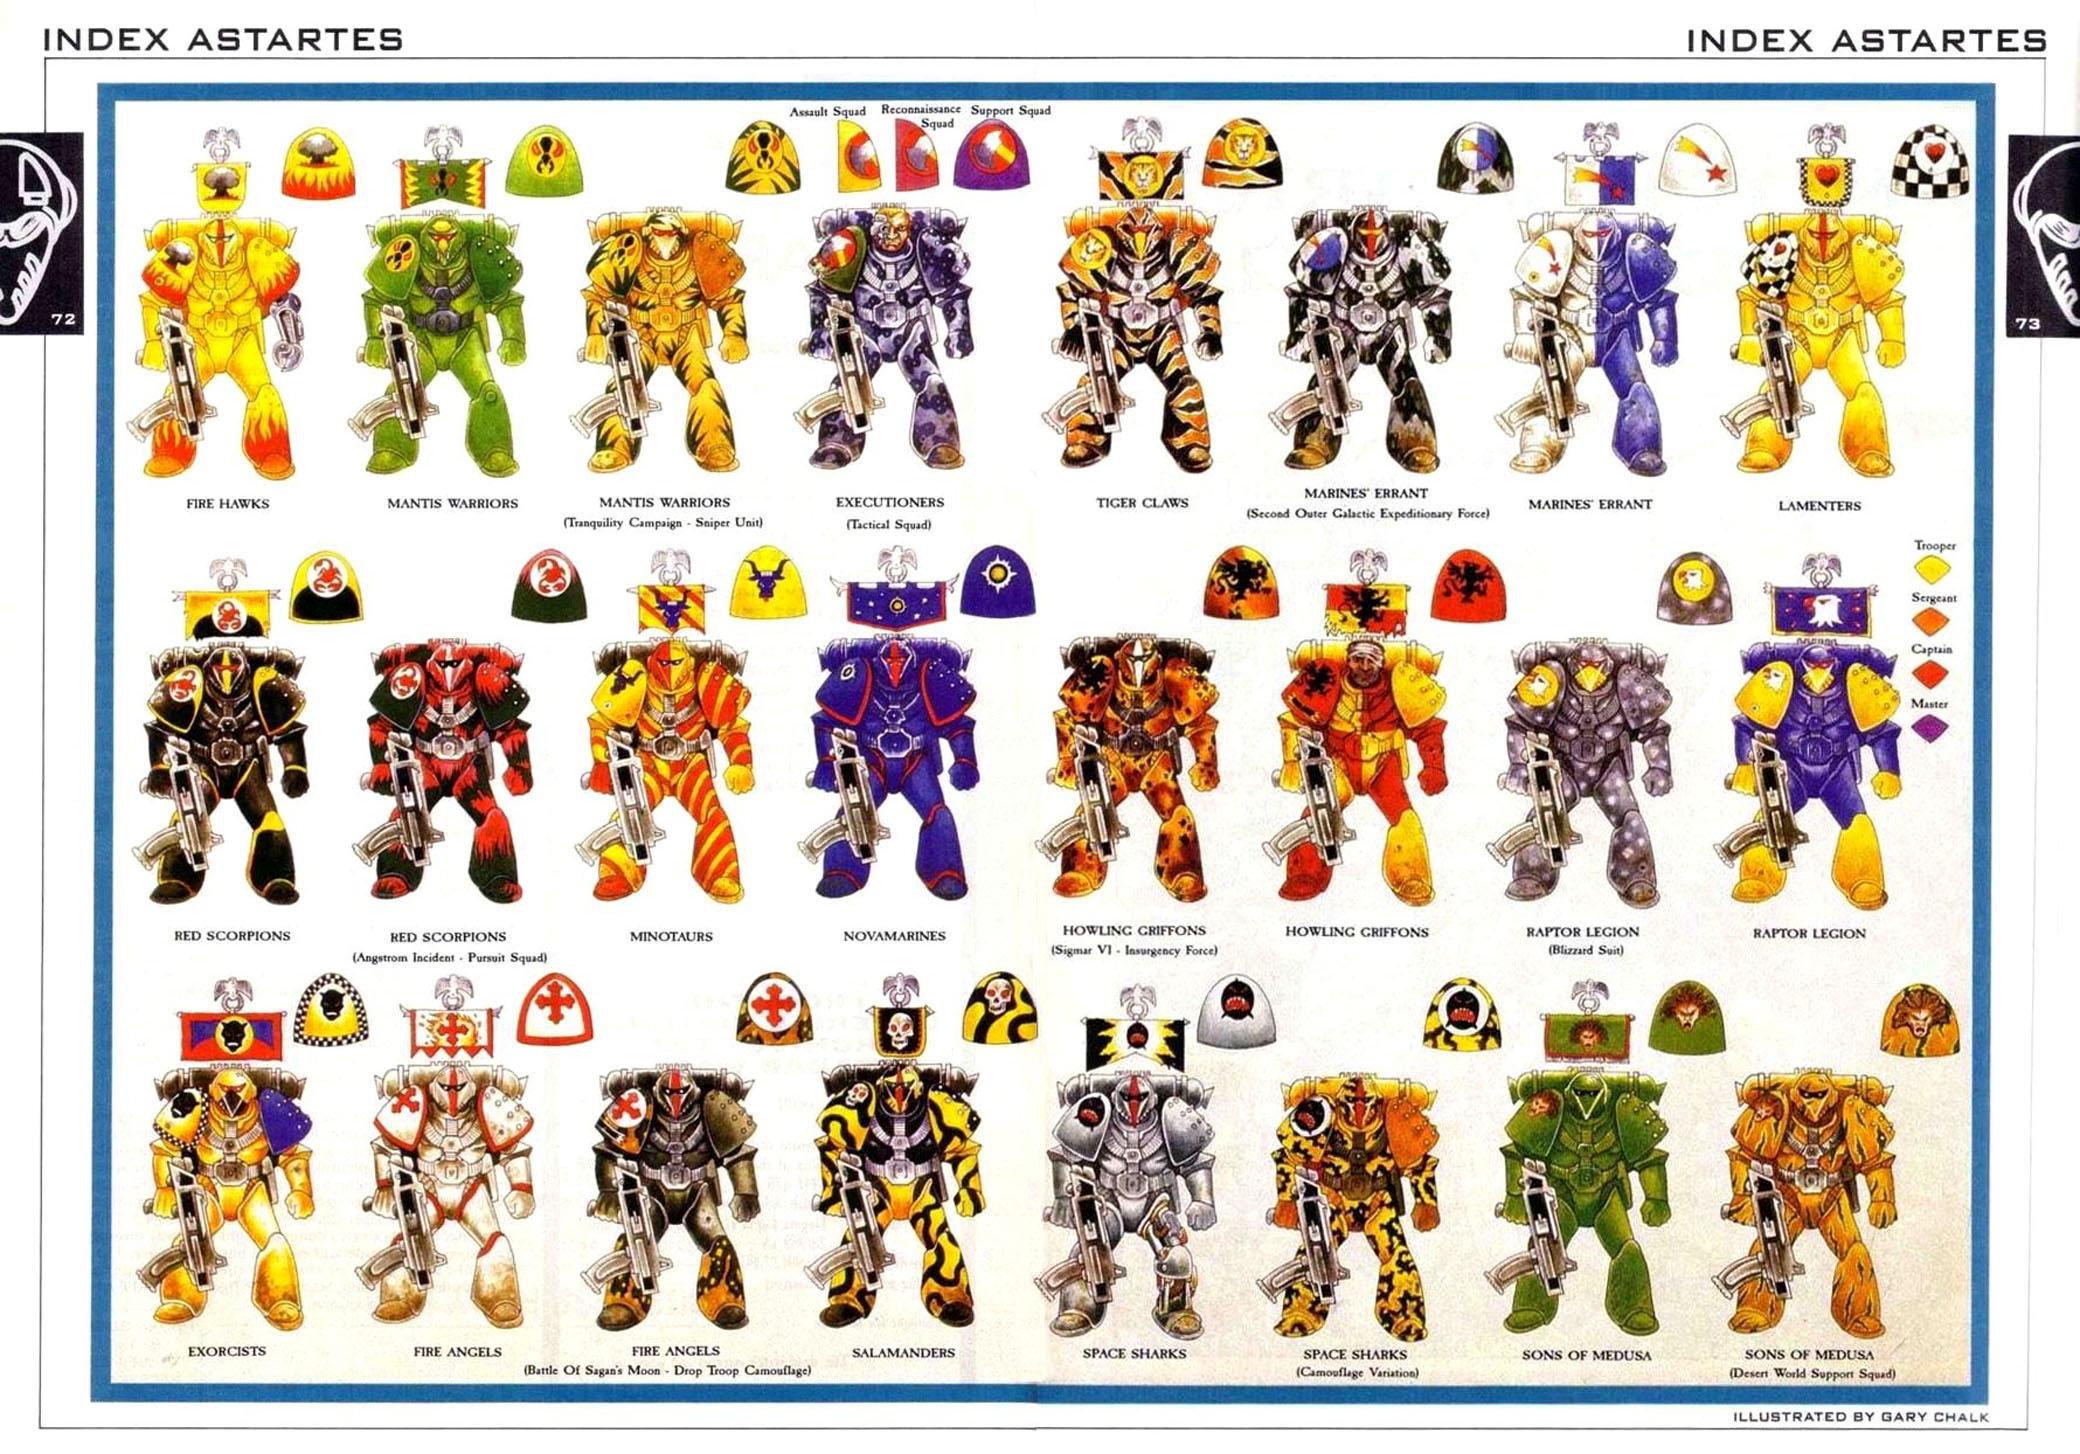 How do you like the badab war colour schemes